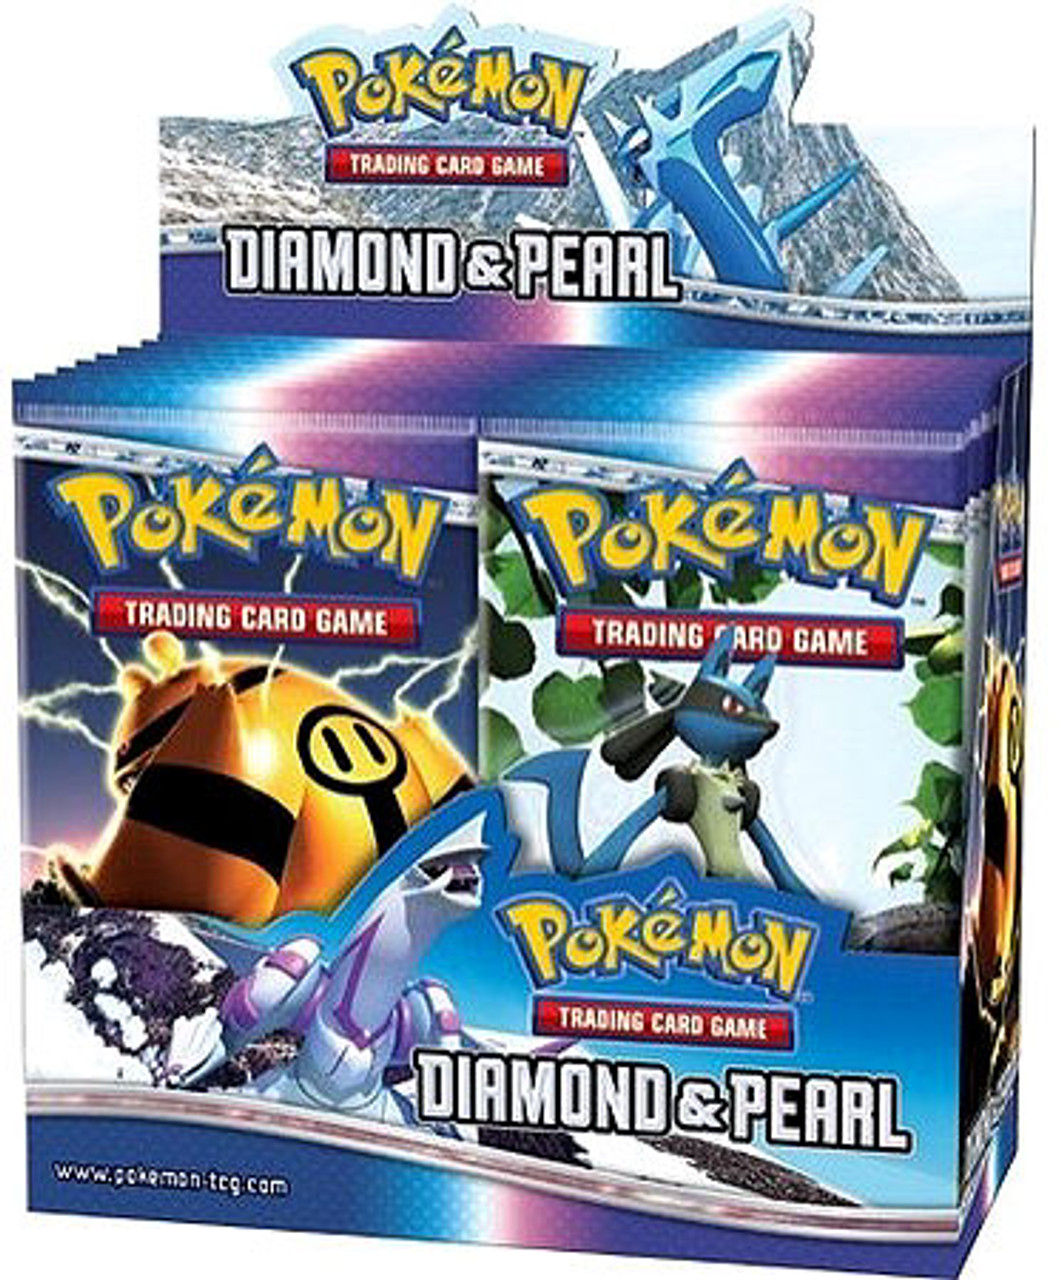 Pokemon Diamond & Pearl Booster Box [36 Packs]